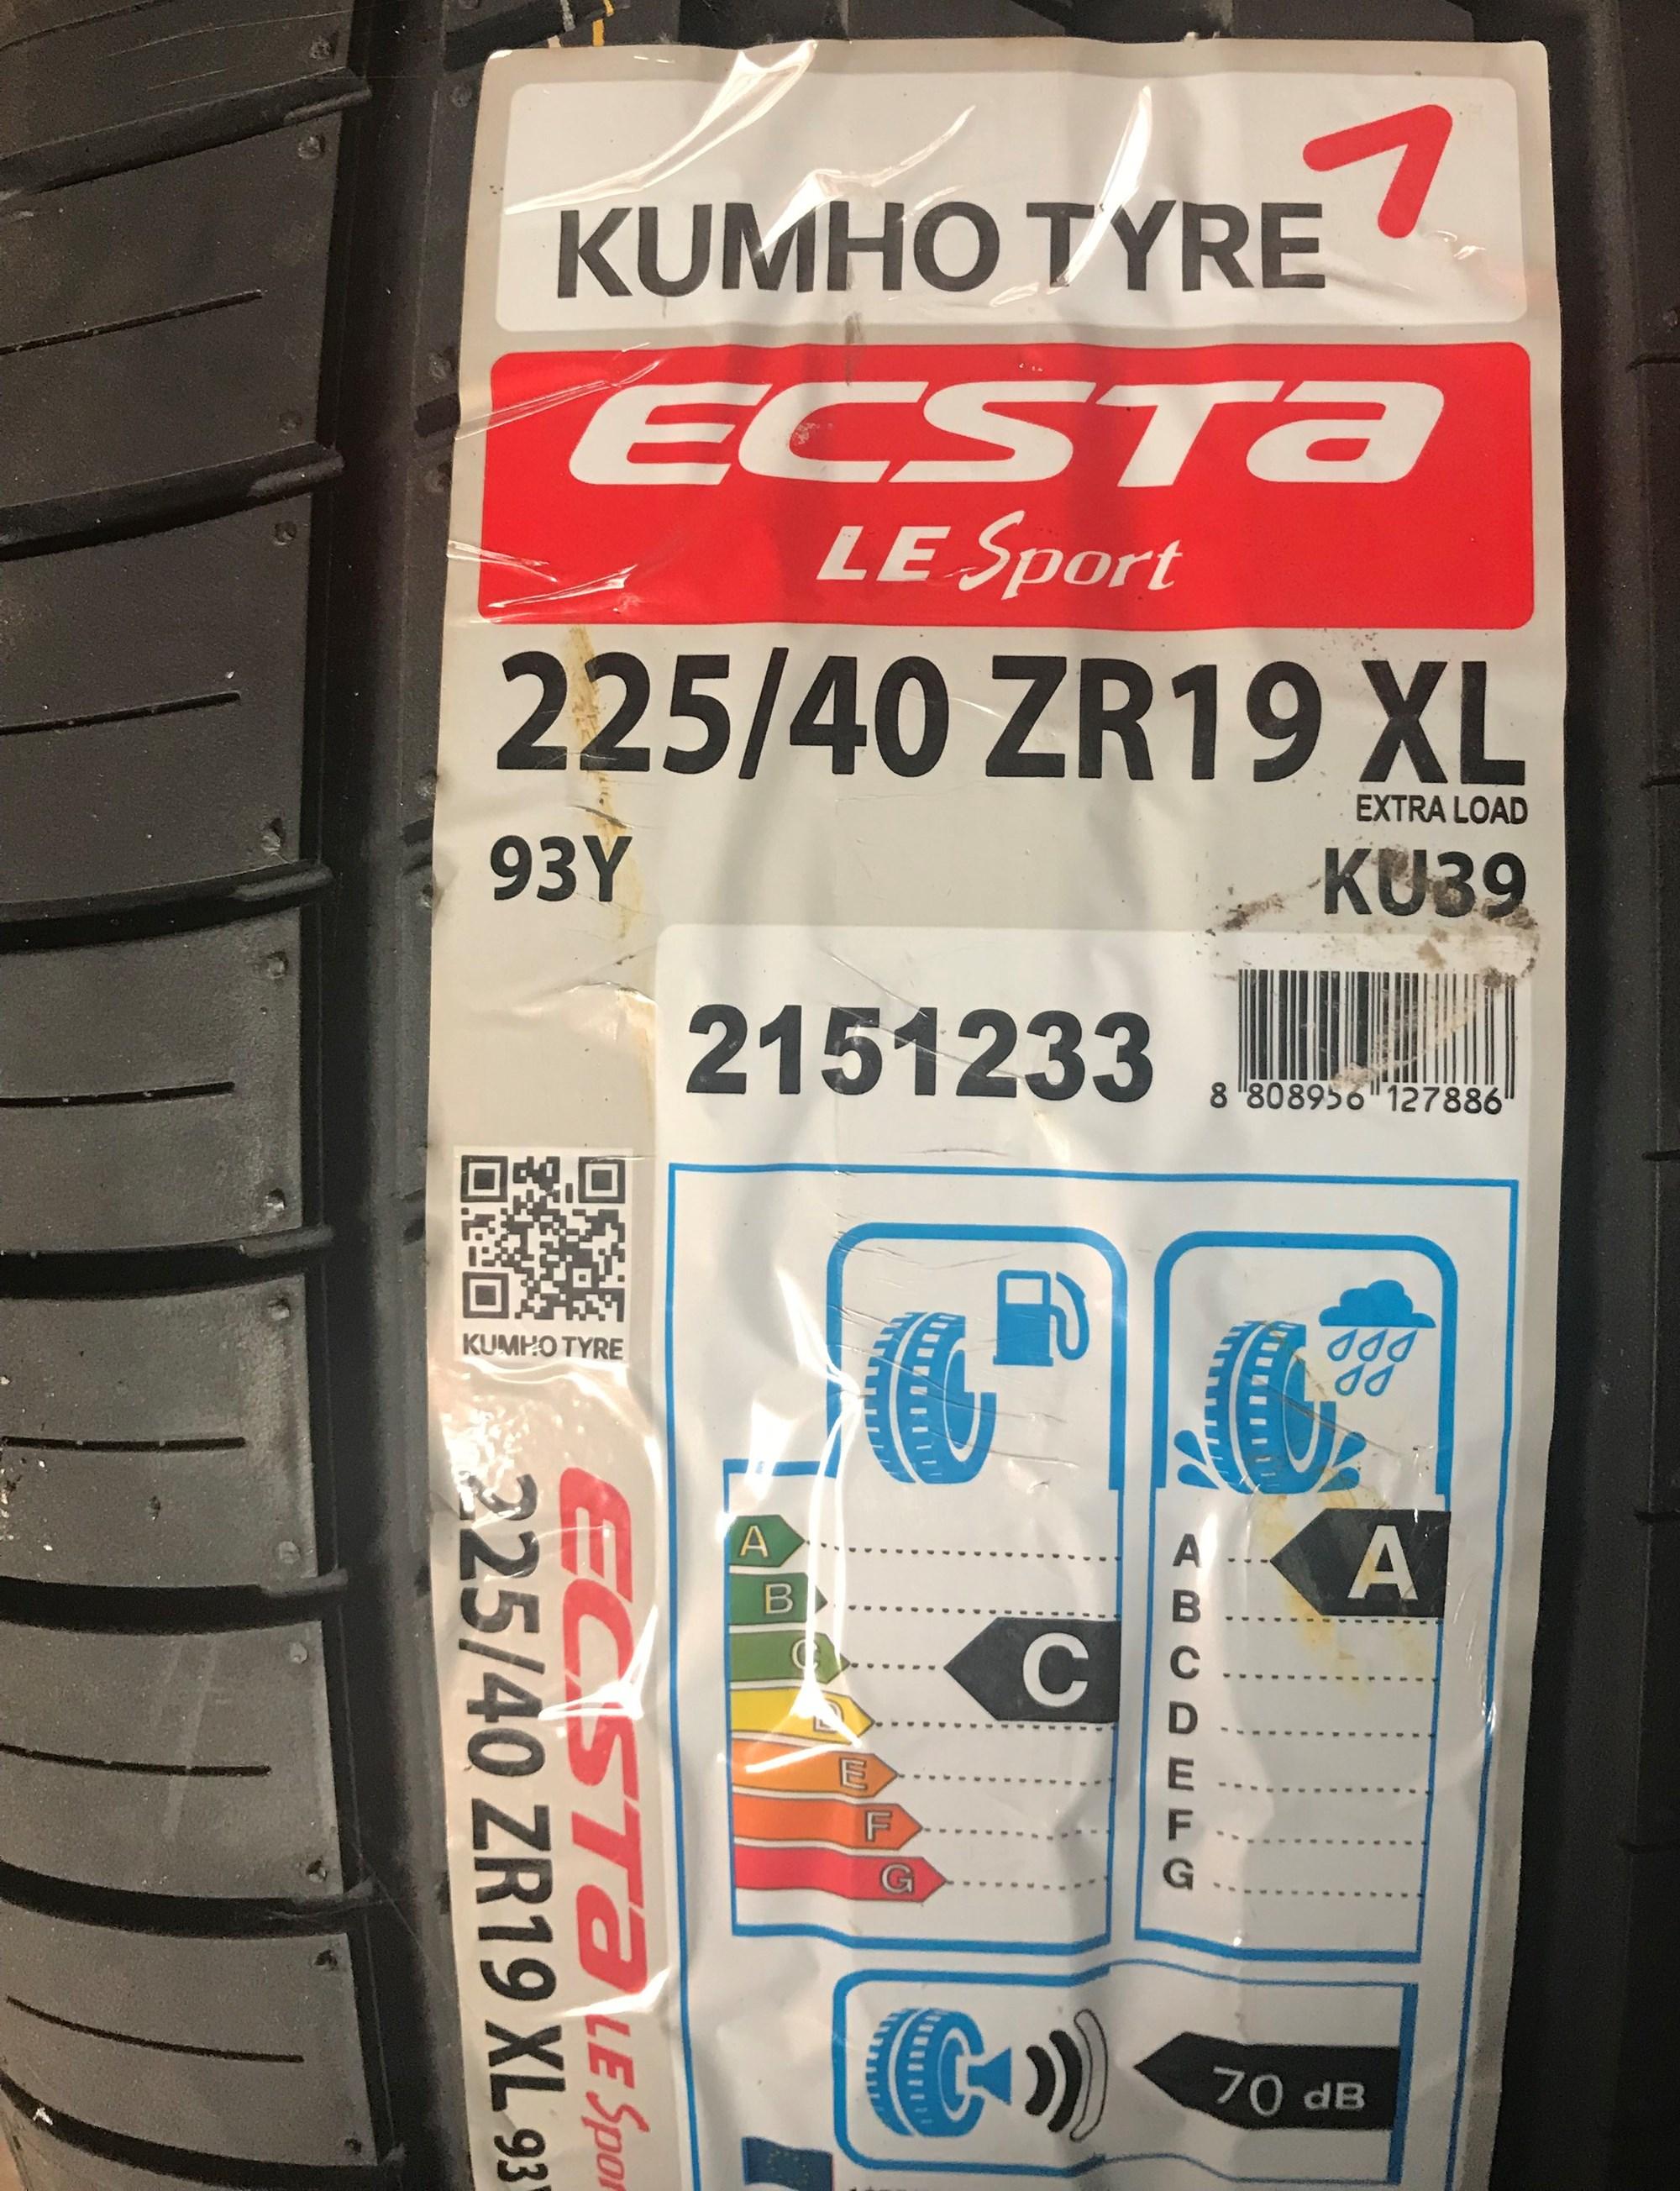 Kumho Ecsta 225/40/19 Tyres